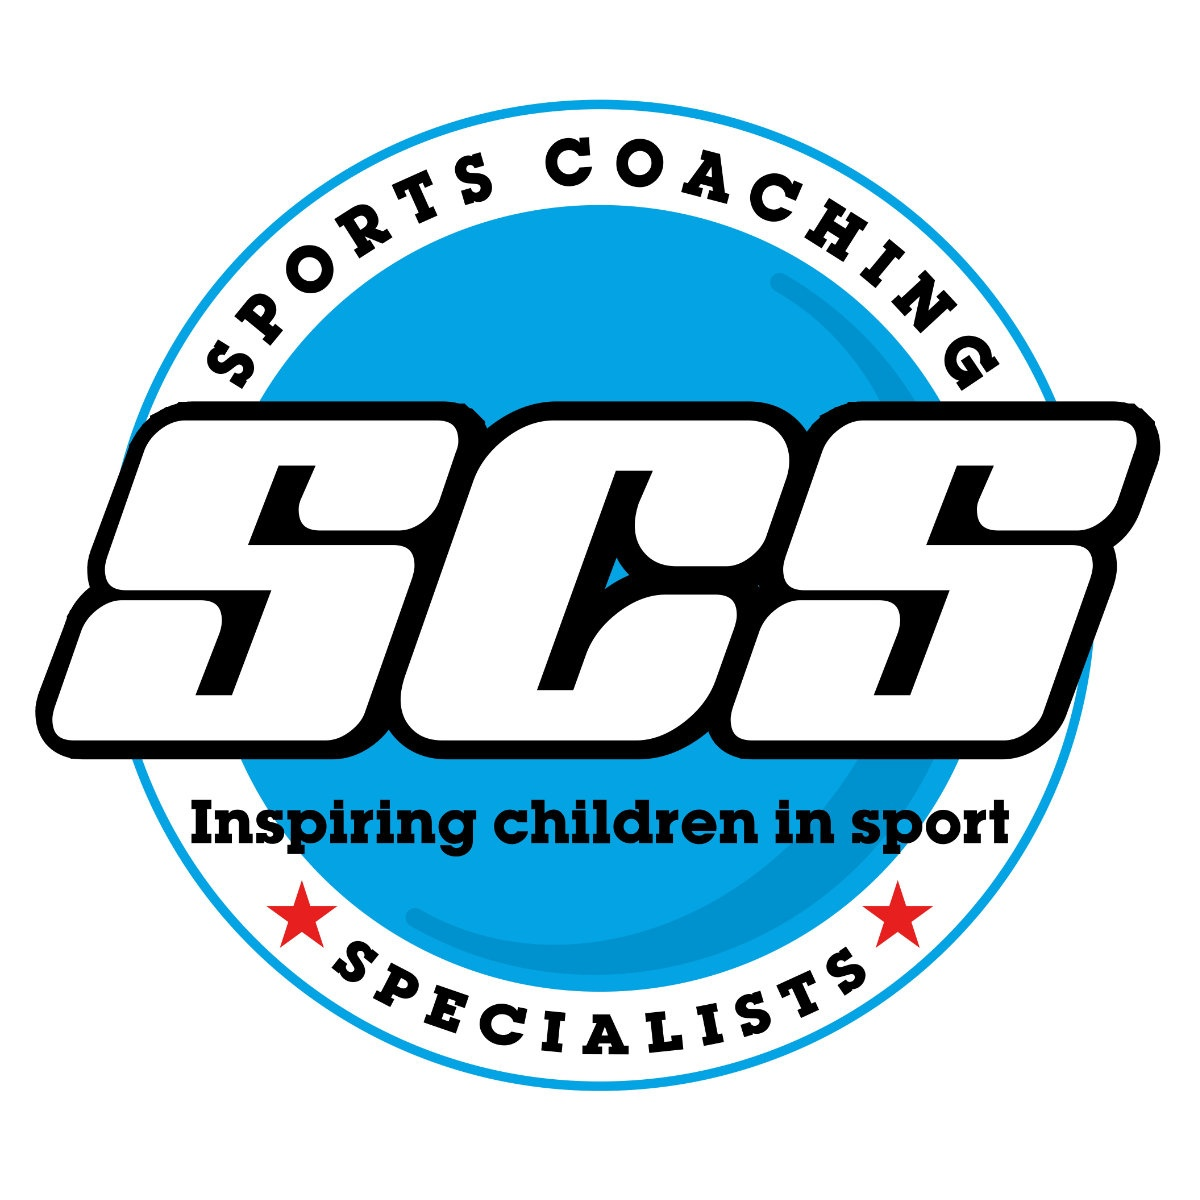 scs-logo-2018